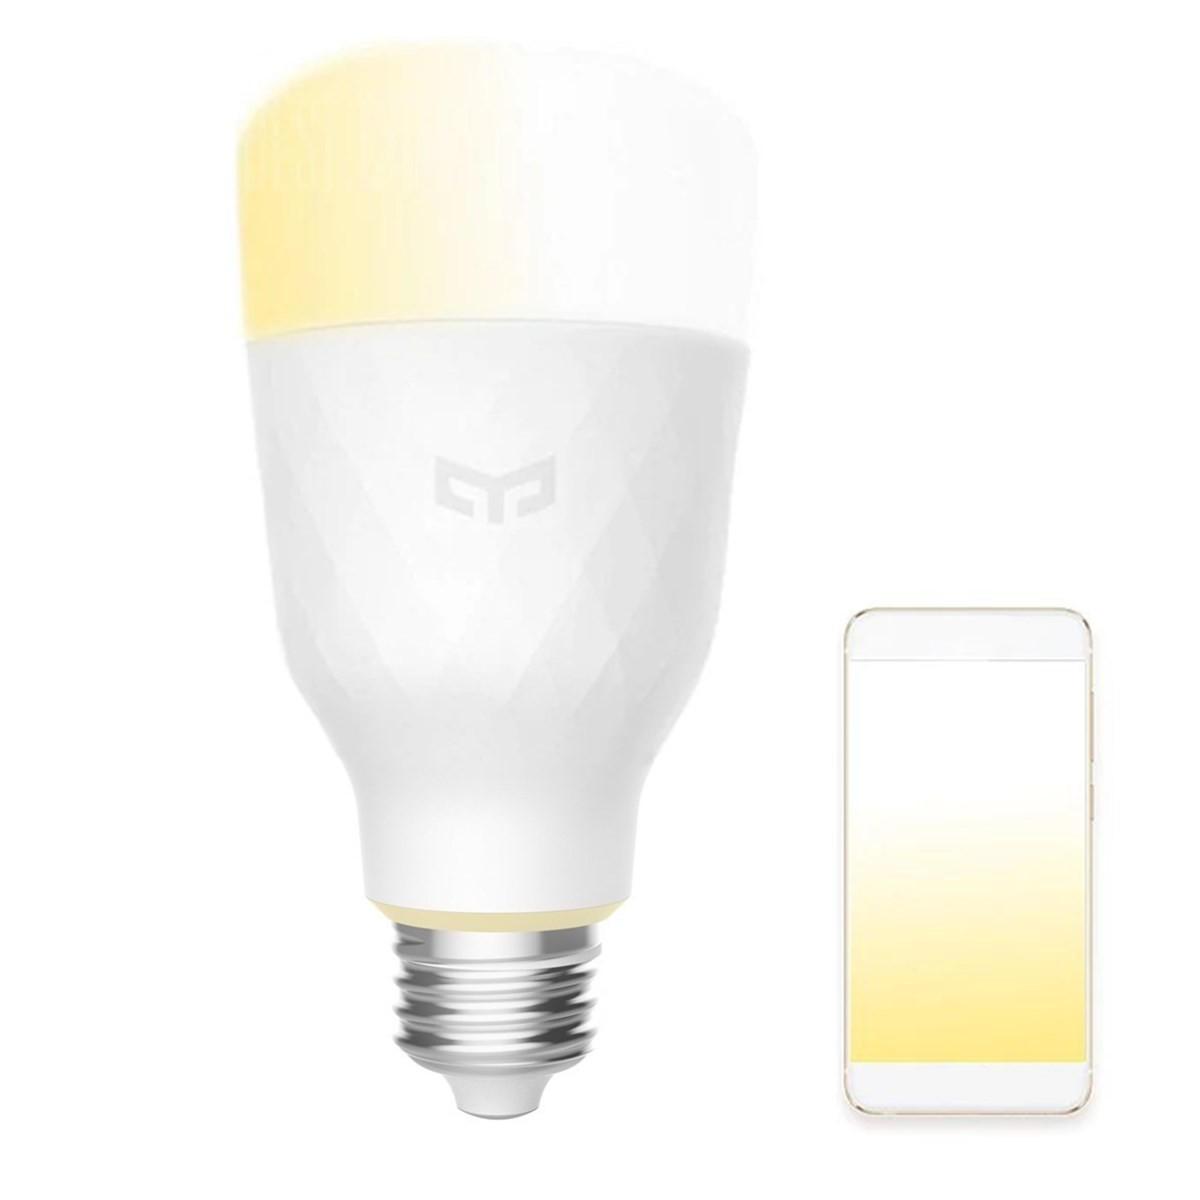 Yeelight Yldp05yl E27 10w Warm White To Daywhite Wifi App Smart Led Bulb Ac100 240v Xiaomi Ecosystem Product Smart Light Bulbs Smart Bulb Smart Lighting